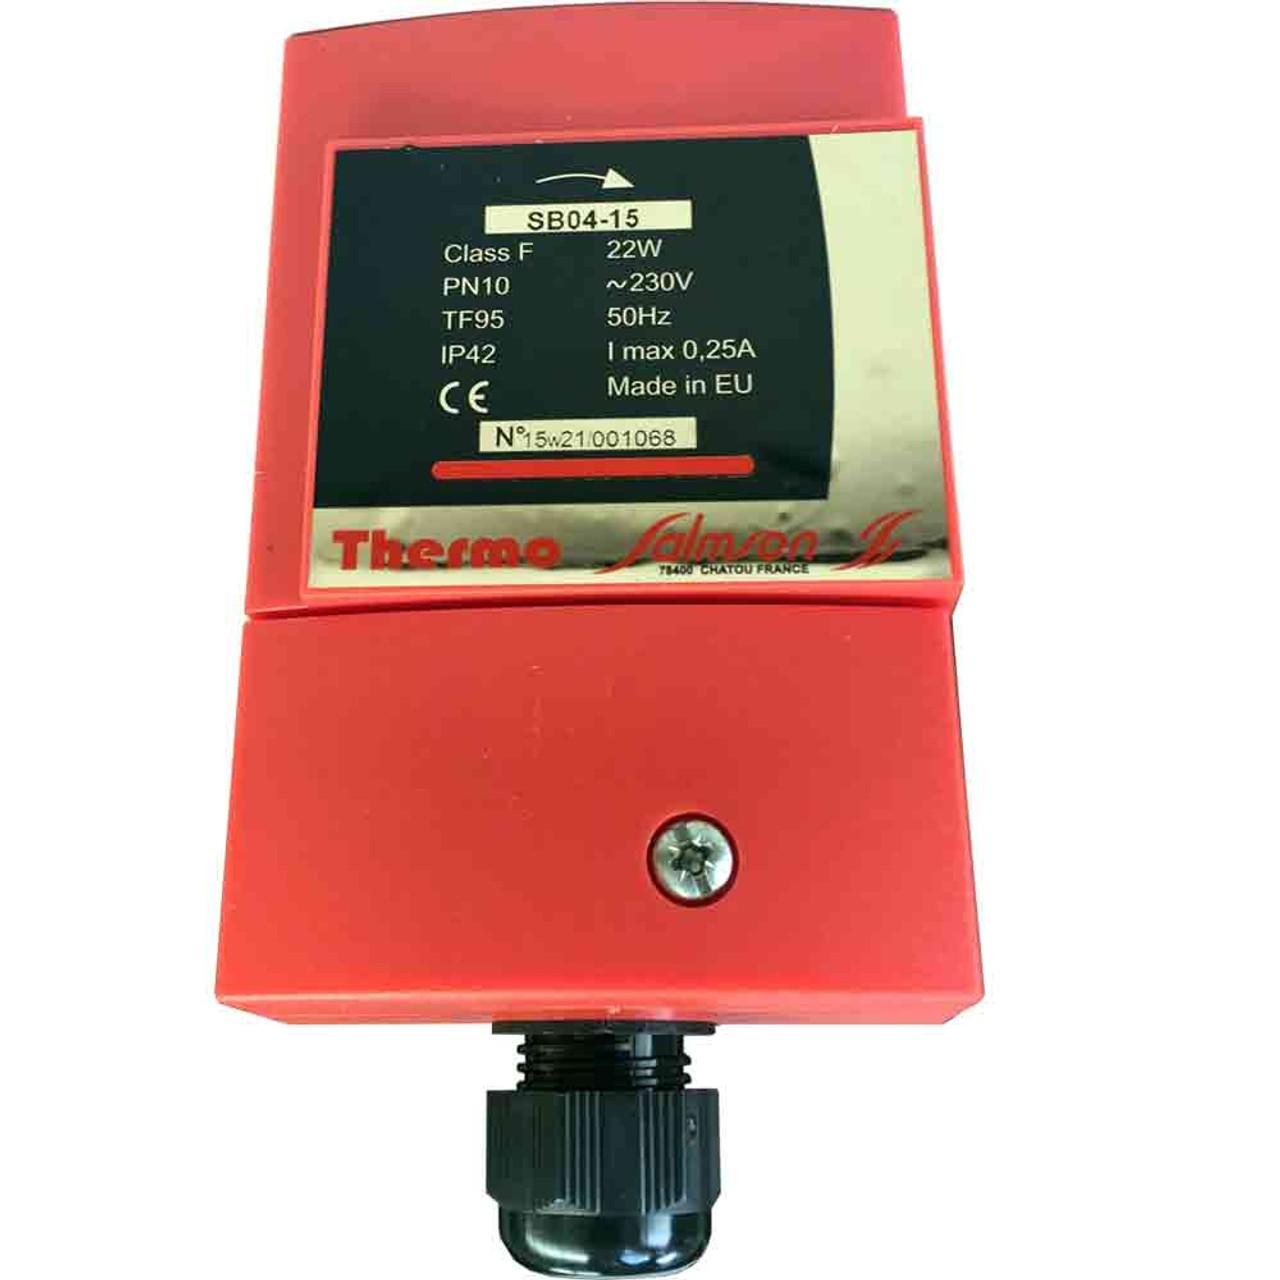 Salmson SOLAR SB 04-15 Solar Hot Water Pump Open Loop system